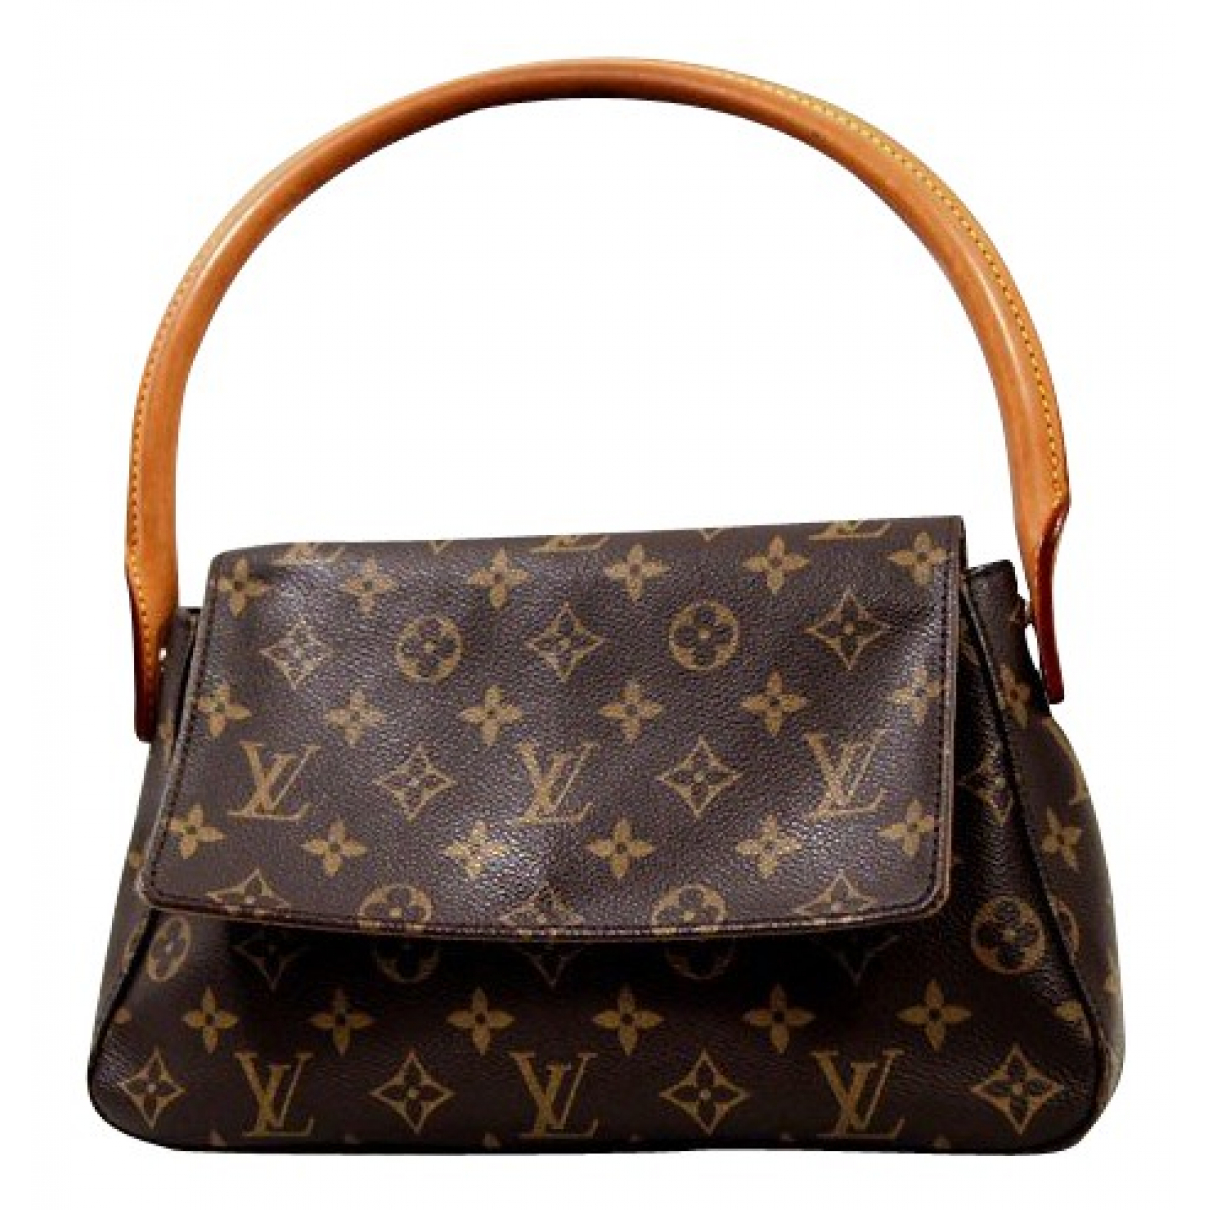 Louis Vuitton - Sac a main Looping pour femme en toile - marron